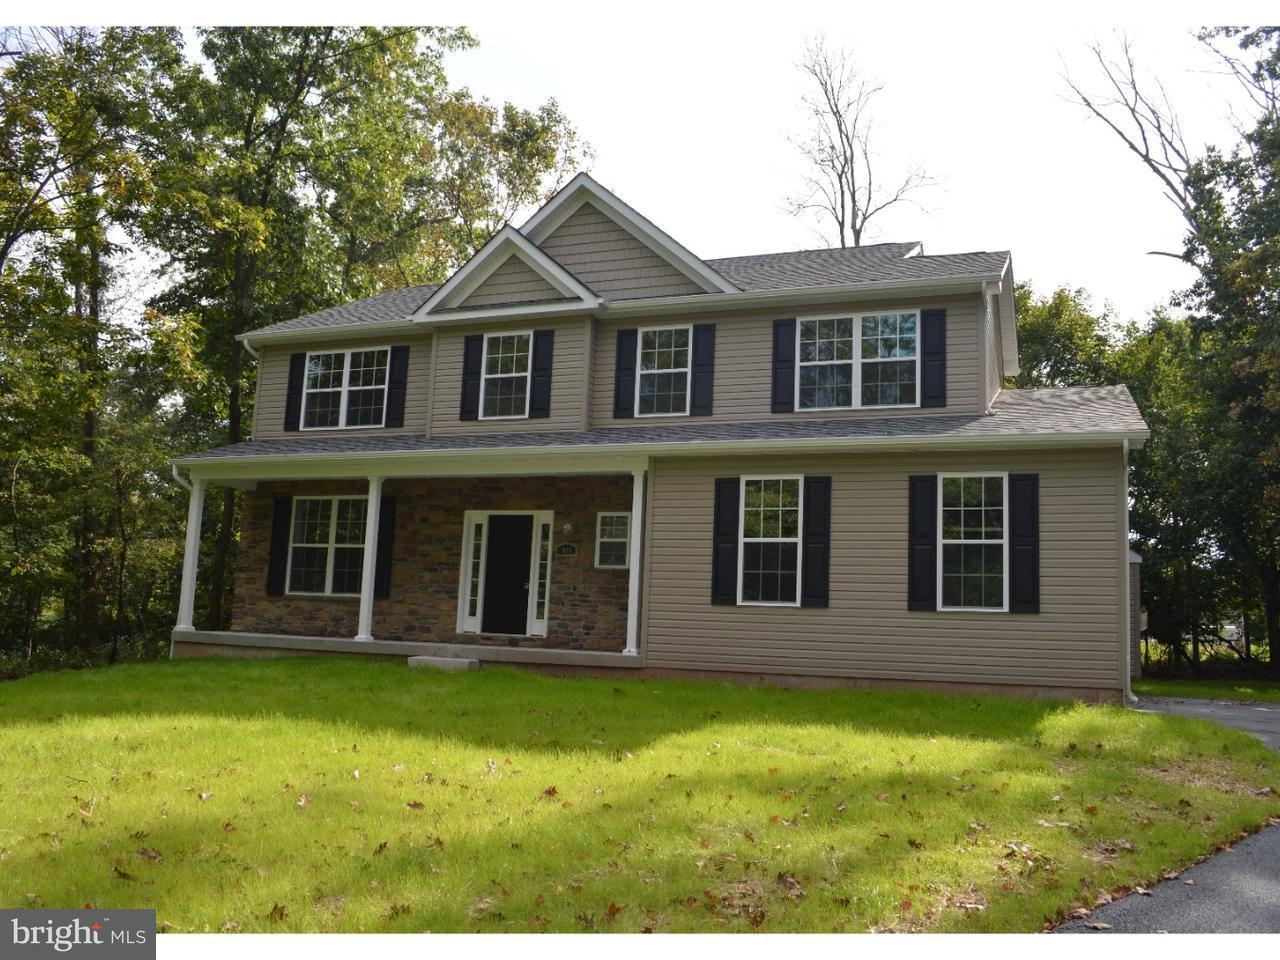 Single Family Home for Sale at LOT 2 WIMBLEDON Lane Hatfield, Pennsylvania 19440 United States